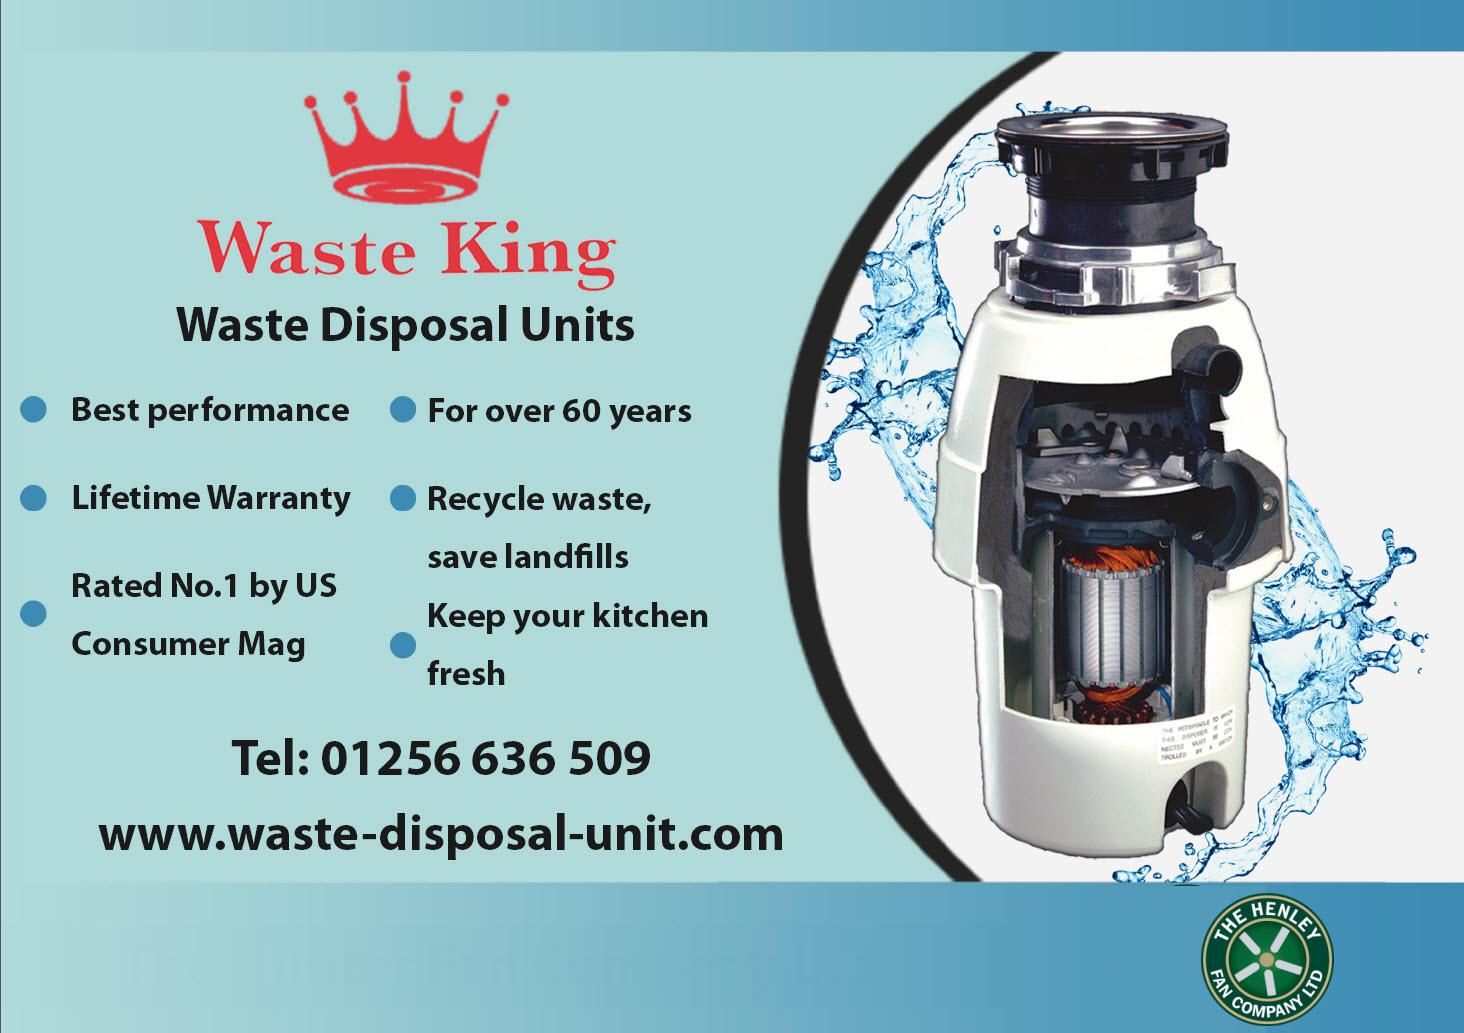 Waste King Price Promotion